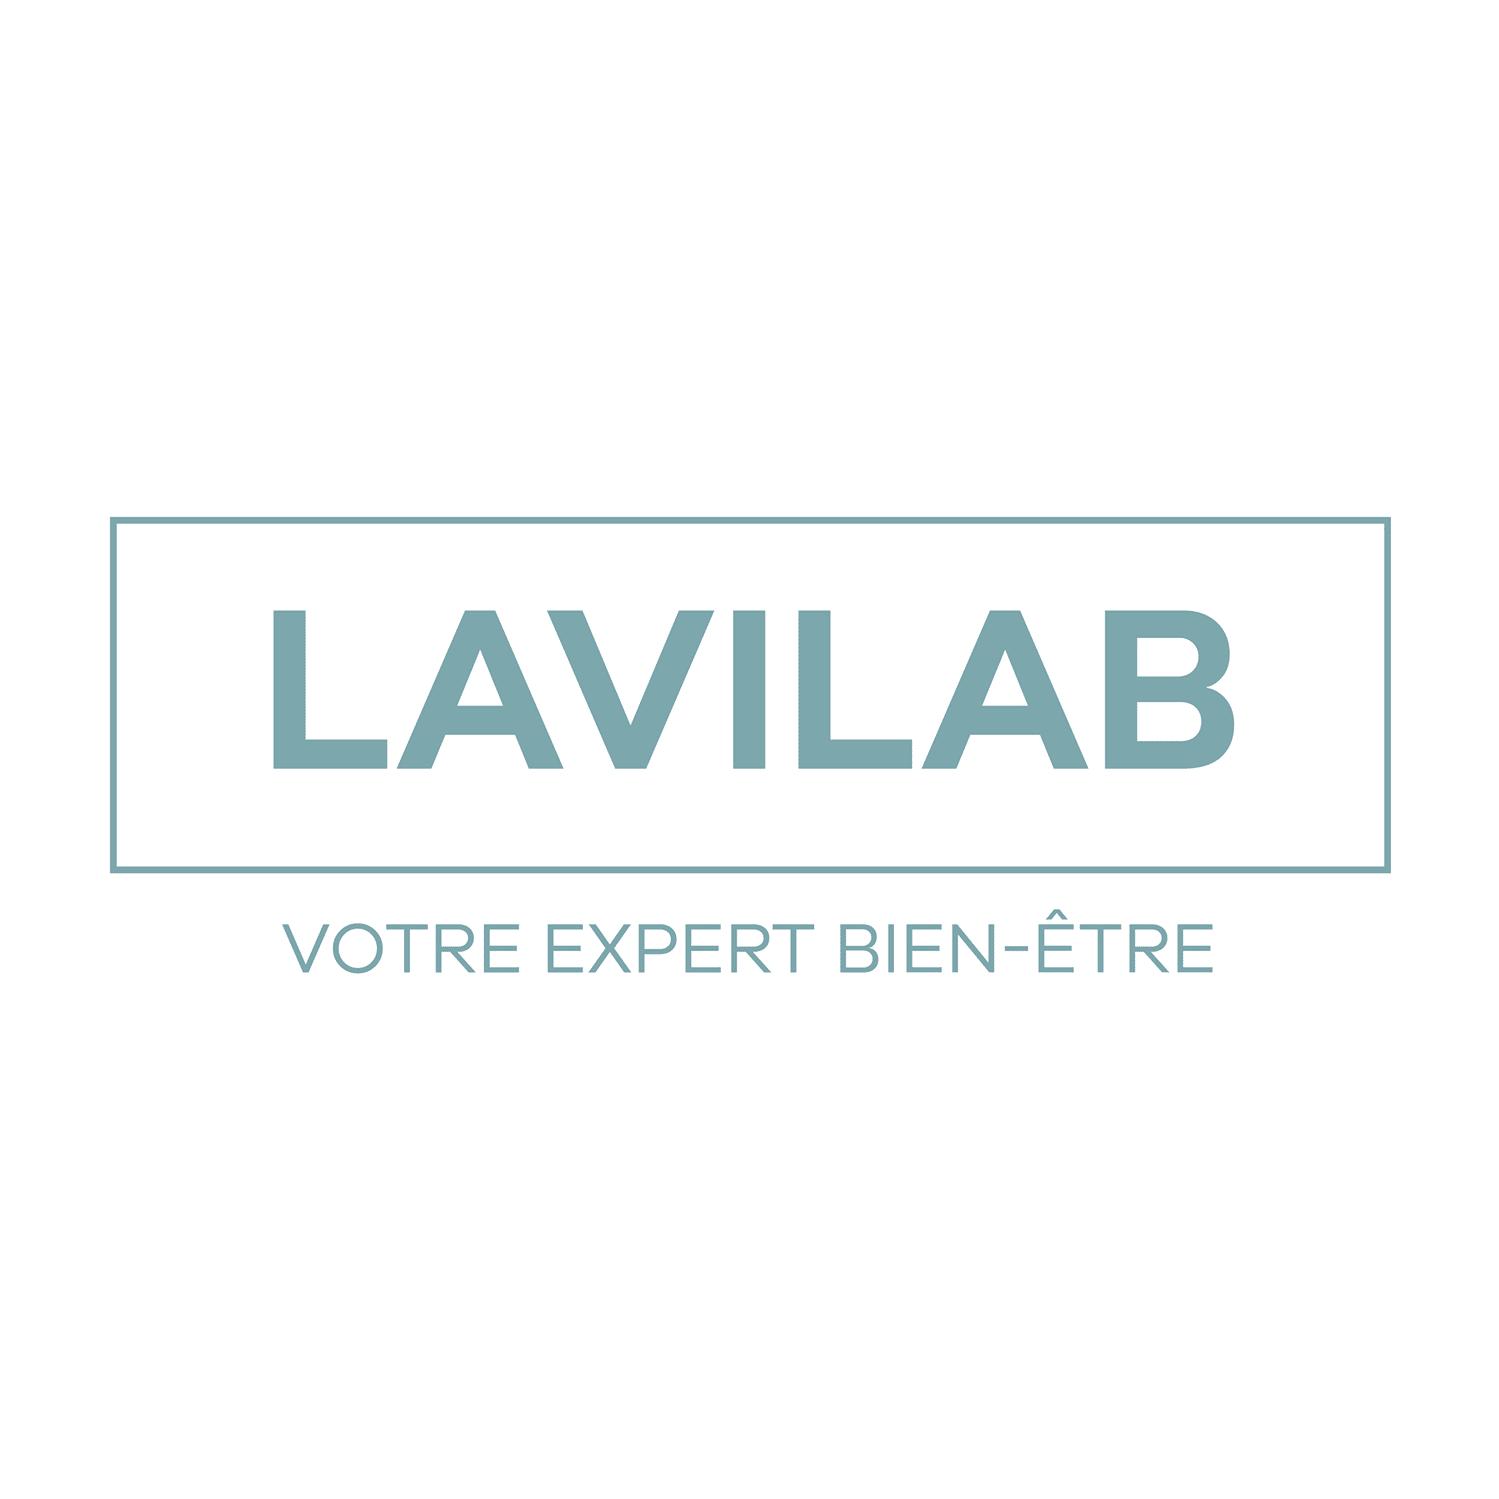 LAVILAB (NMC LAB)